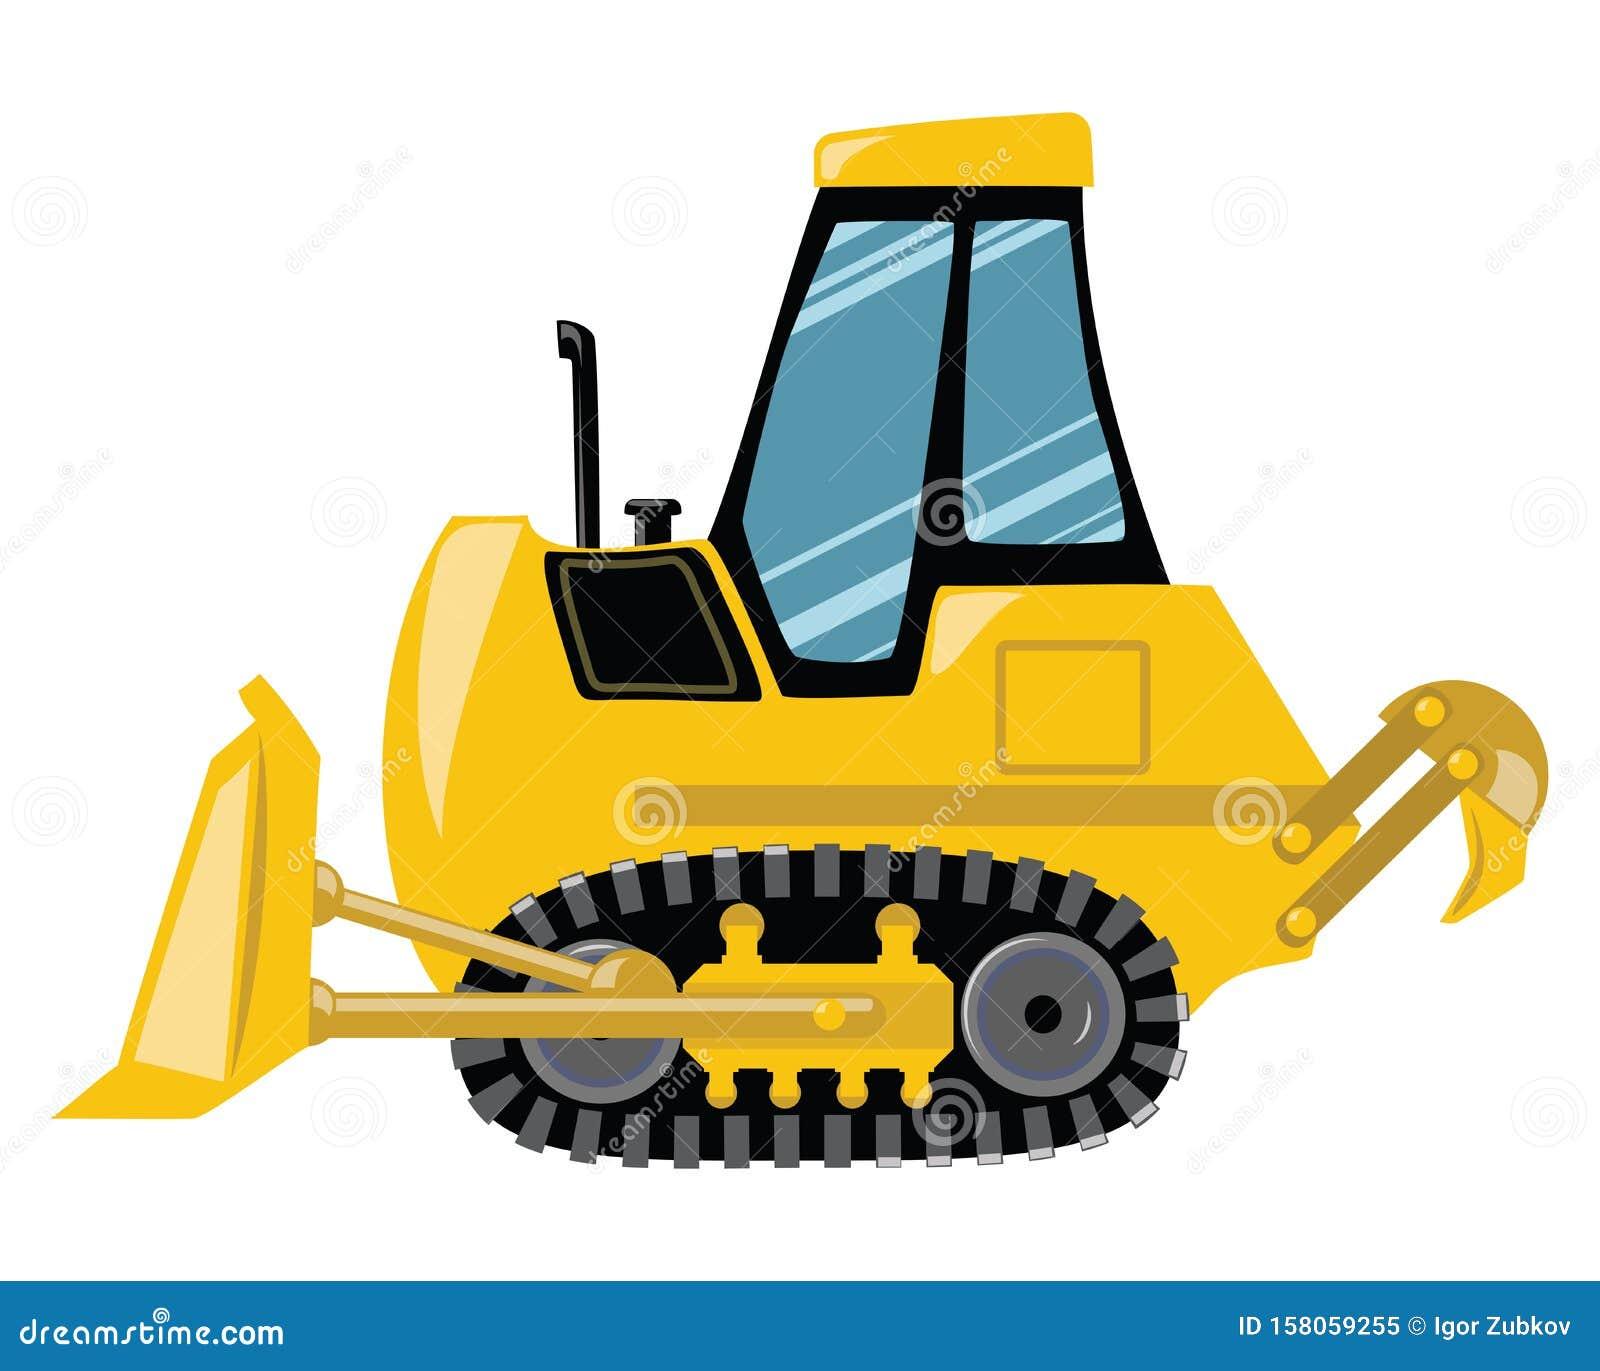 Cartoon bulldozer. Vector illustration of construction machinery. Drawing for children.